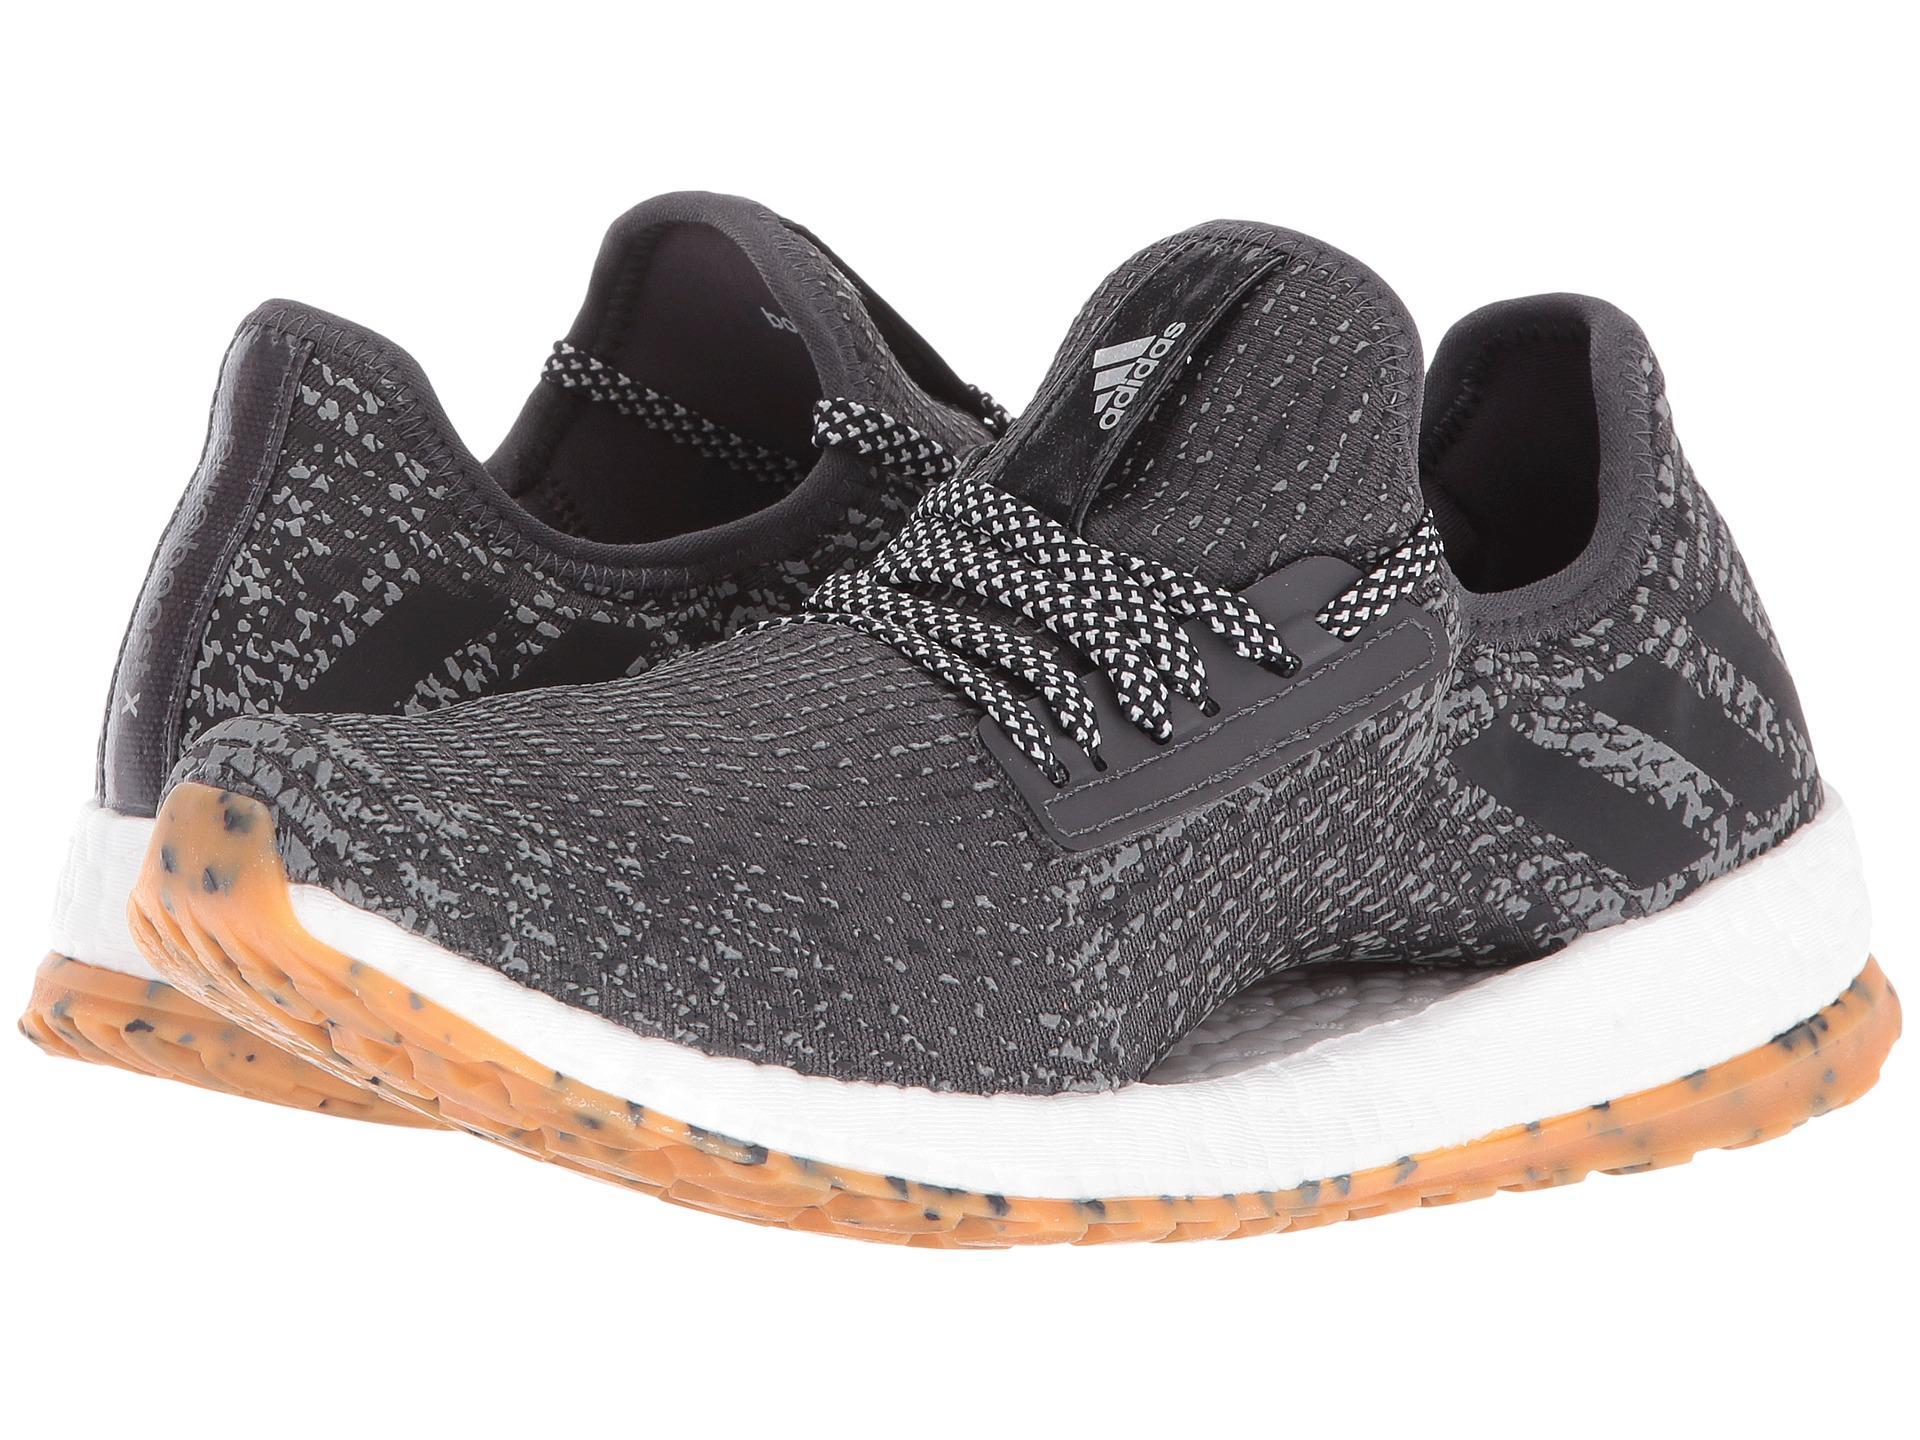 info for b6899 35234 Lyst - adidas Originals Pure Boost X Atr in Black for Men